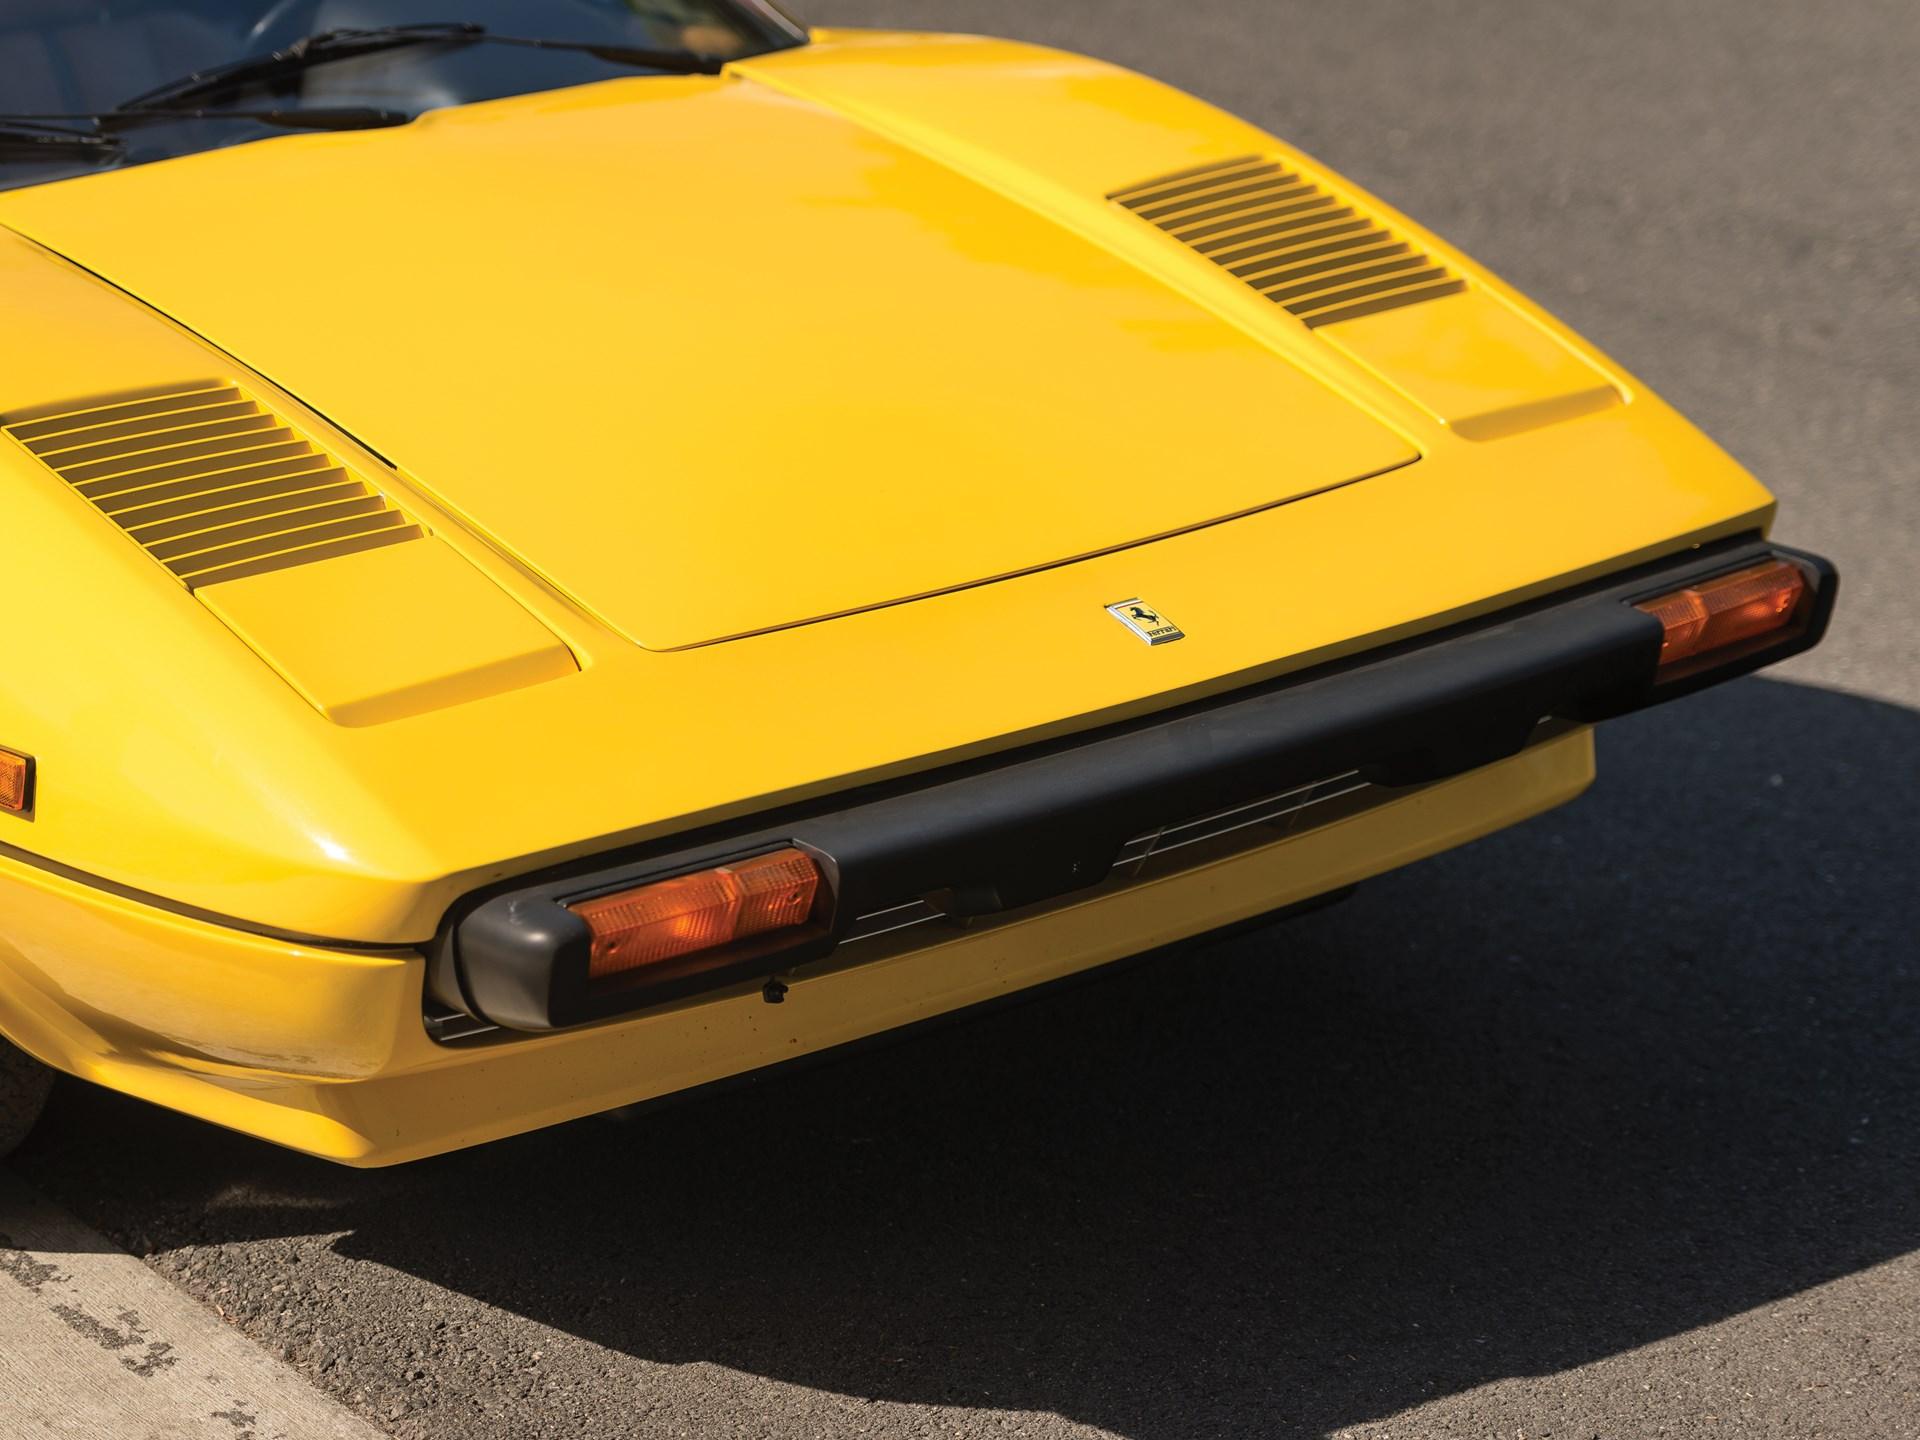 1976 Ferrari 308 GTB 'Vetroresina'